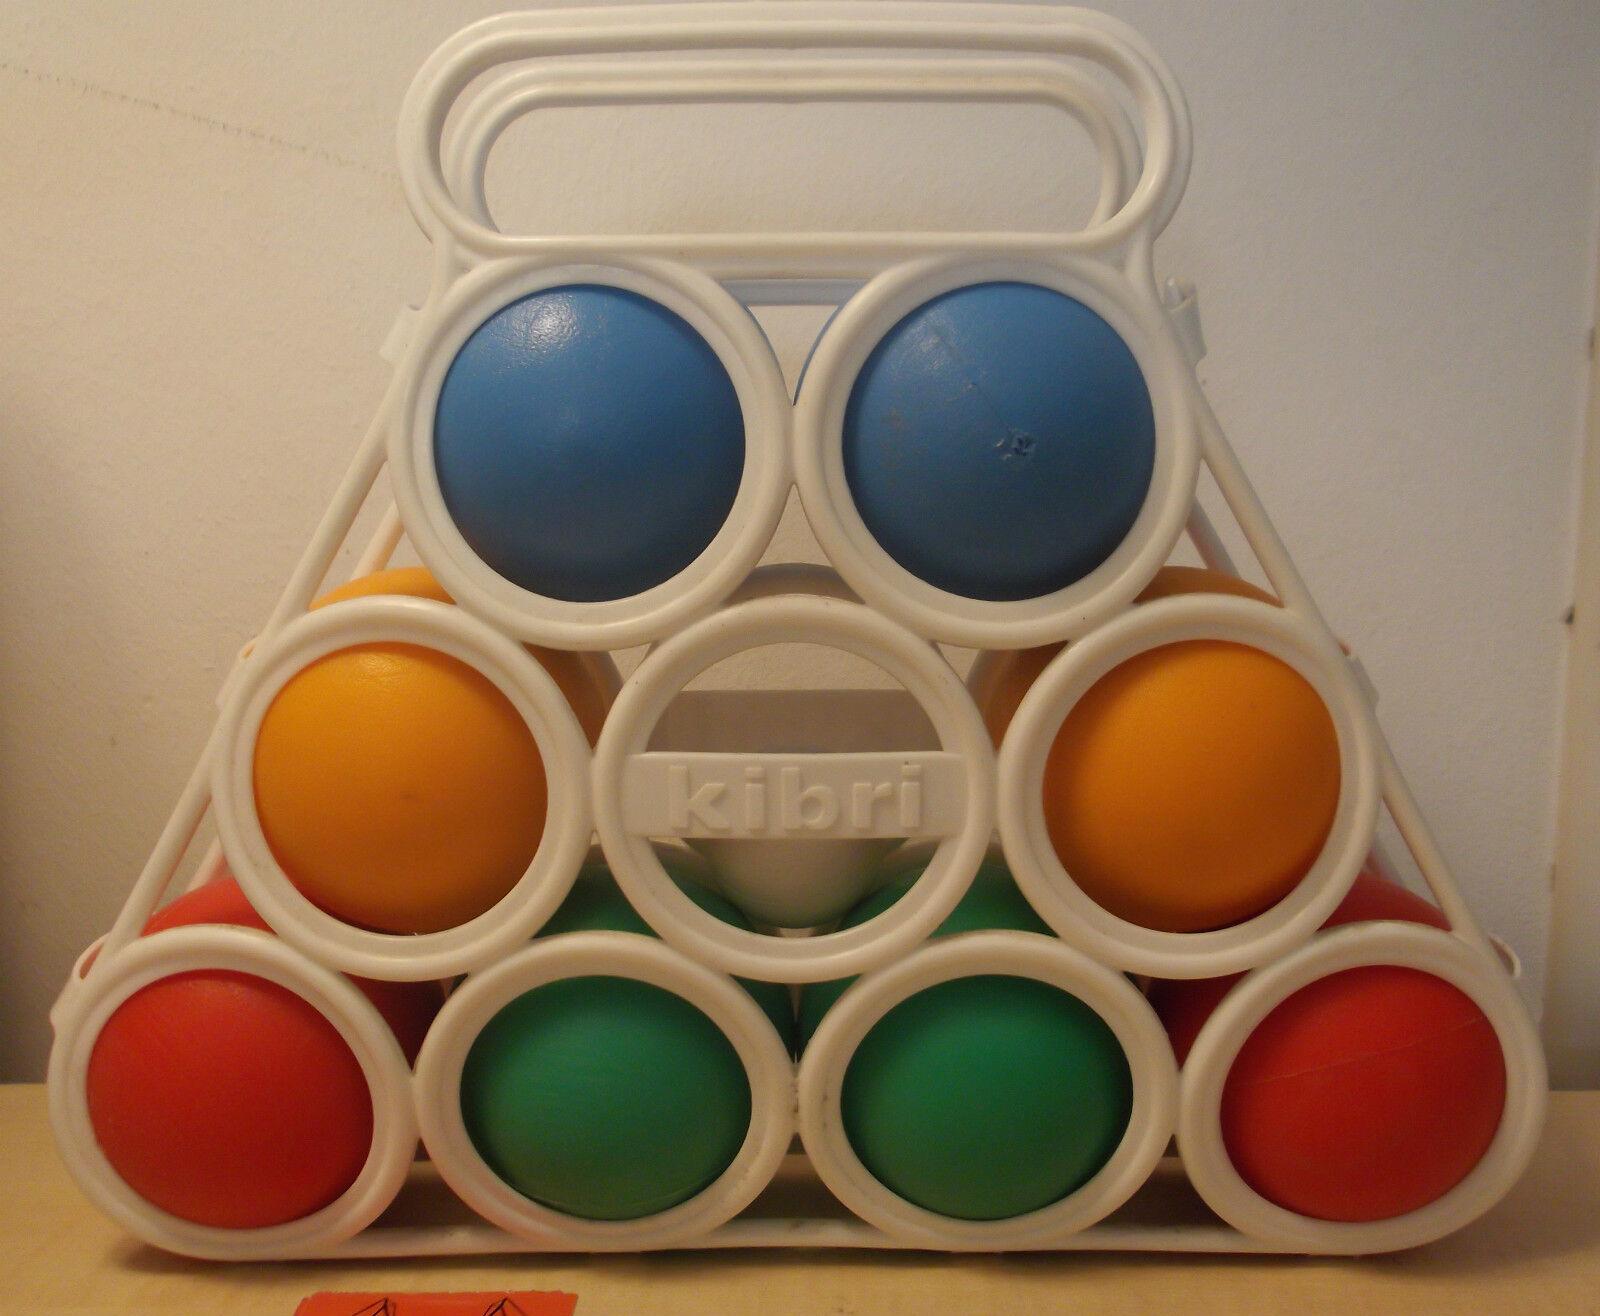 Absolute Rarity  KIBRI bocciaspiel with Small Ball erstklassig